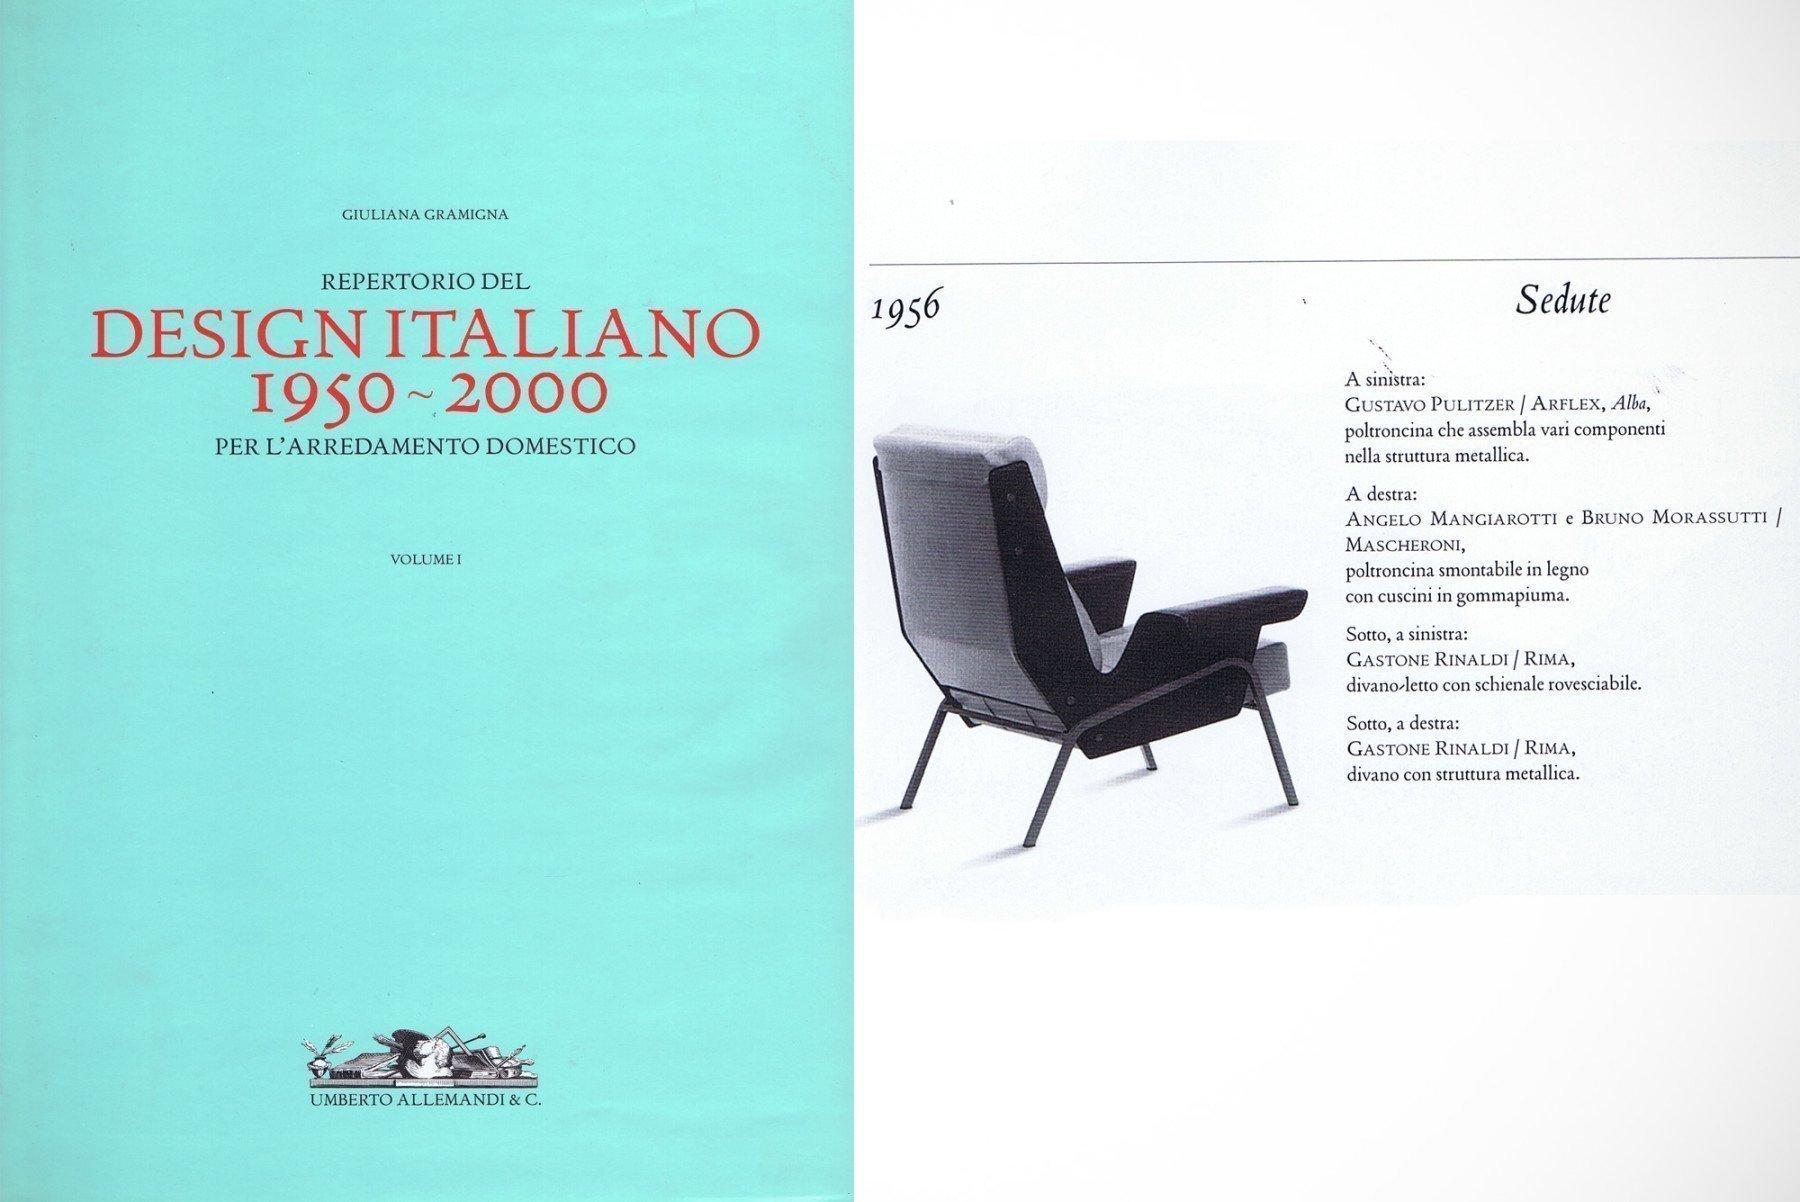 Gustavo Pulitzer |                              Alba - lounge chair